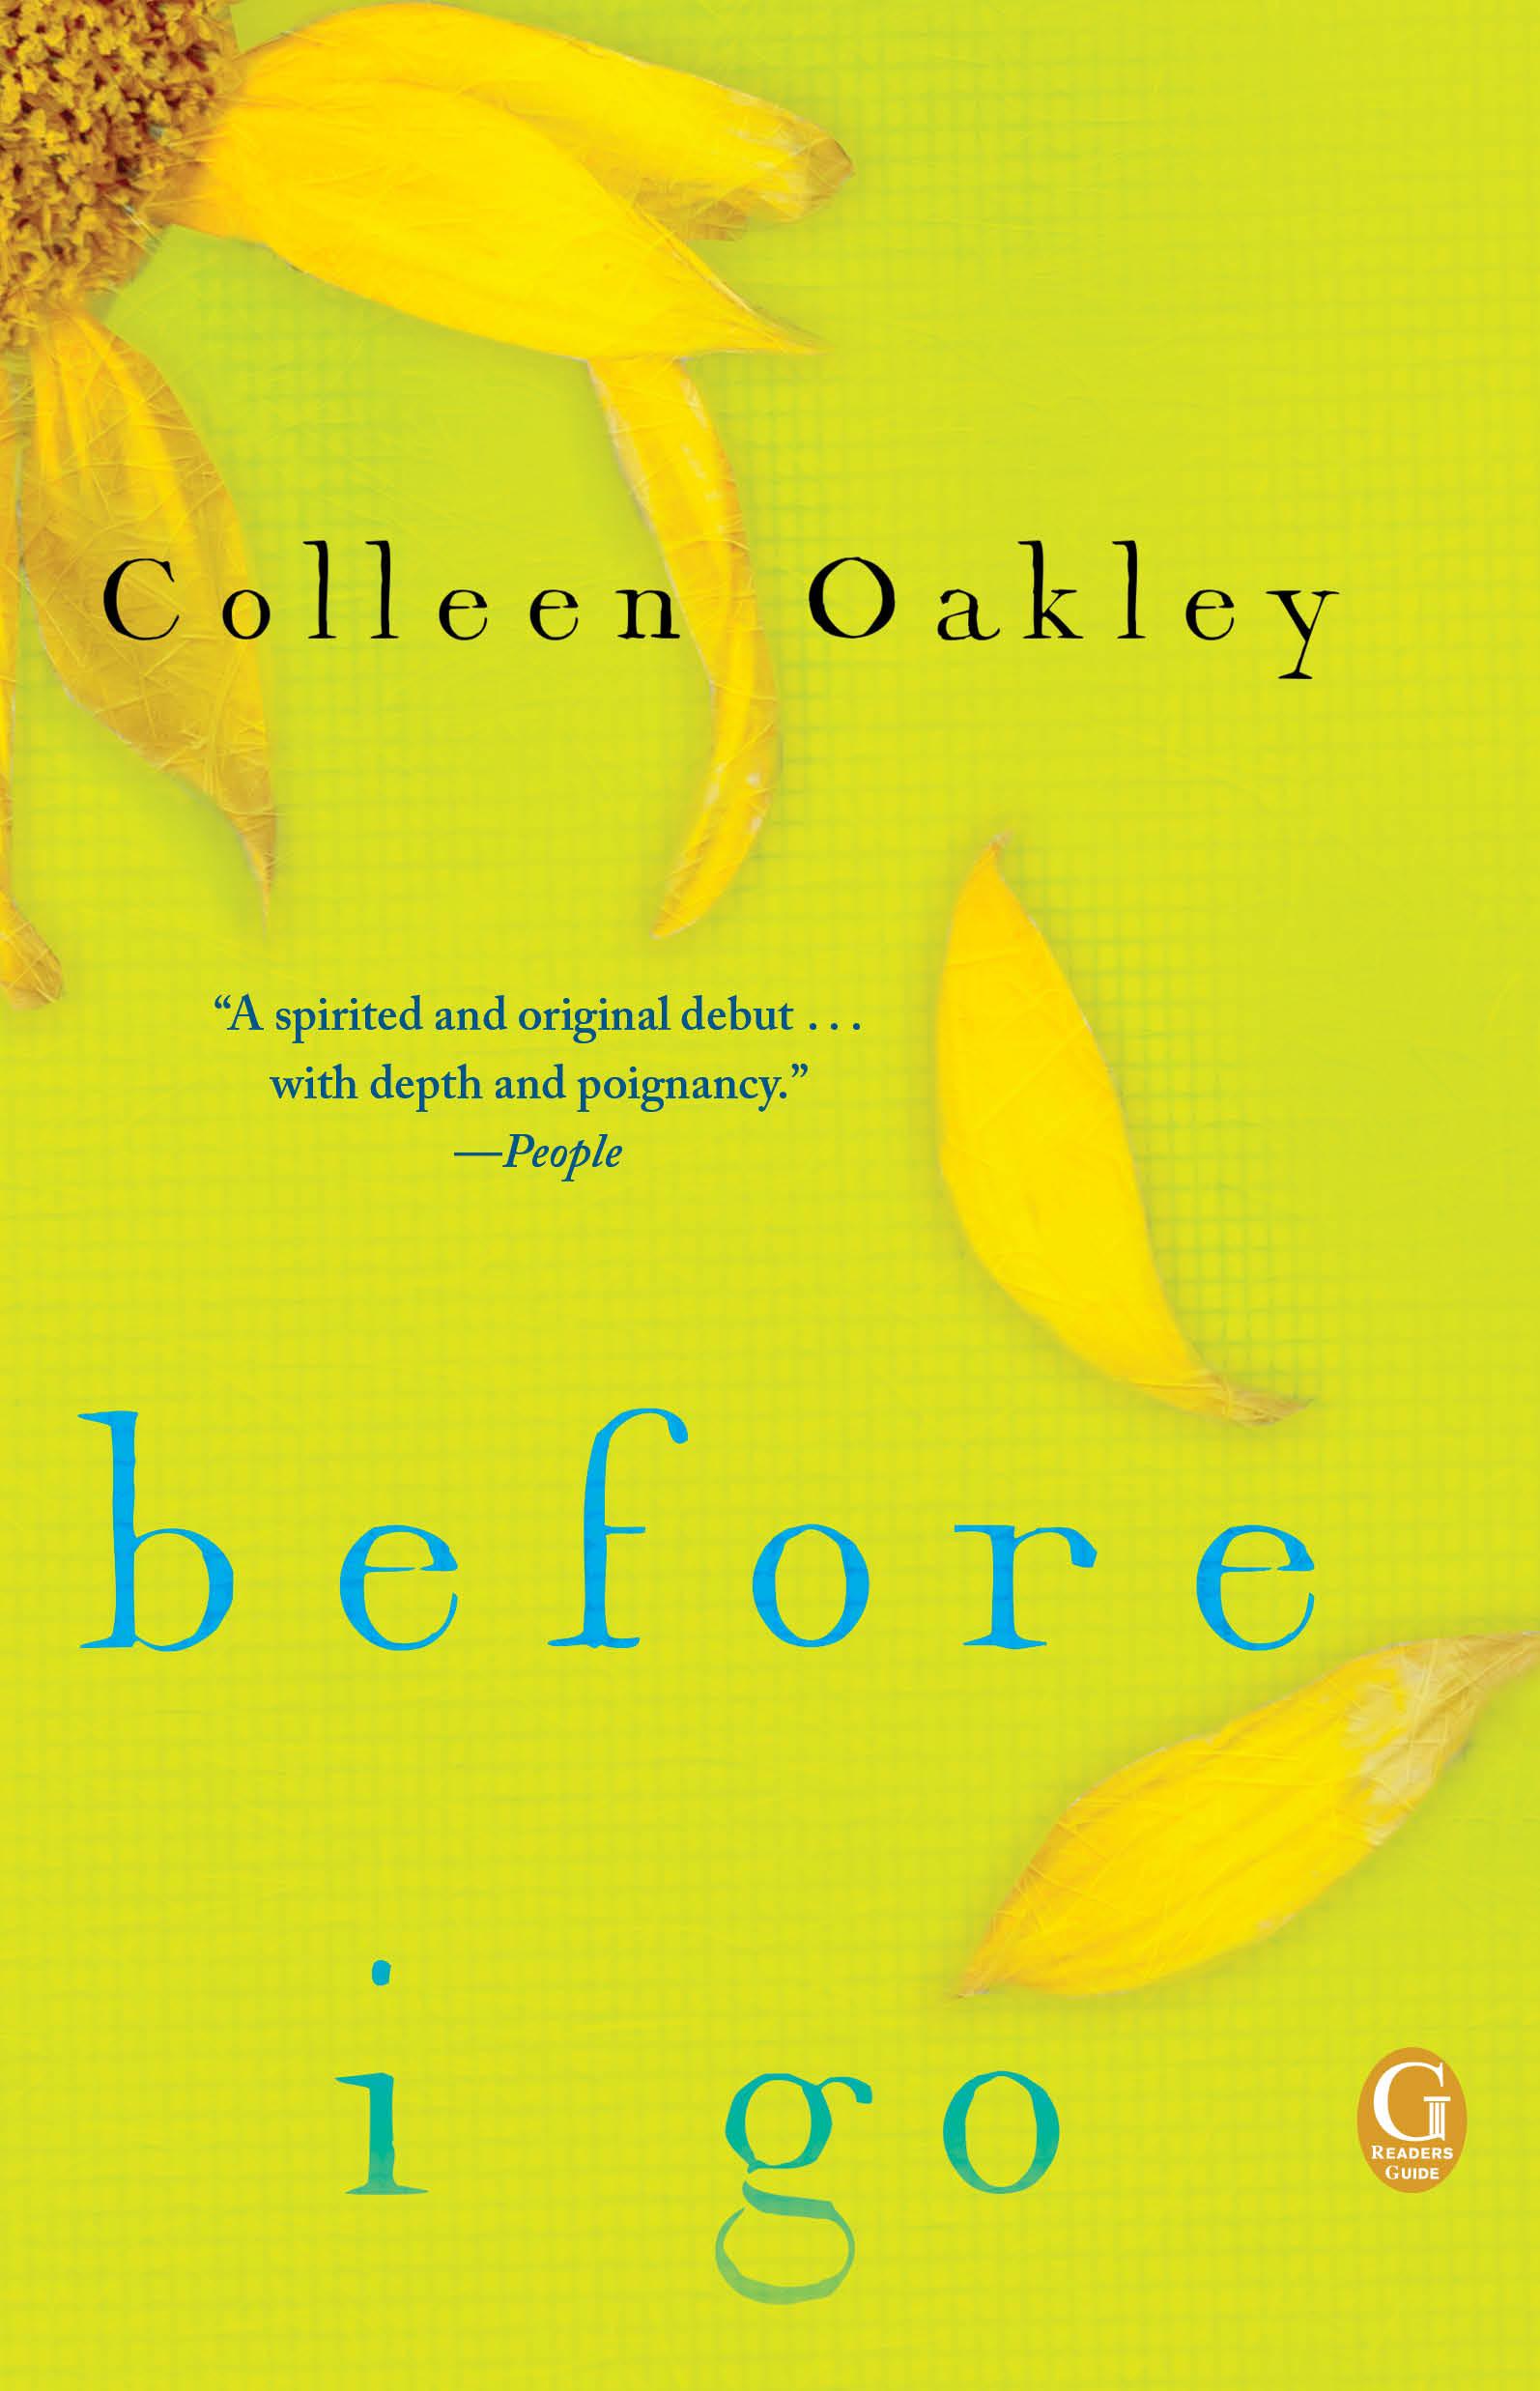 colleen oakley facebook